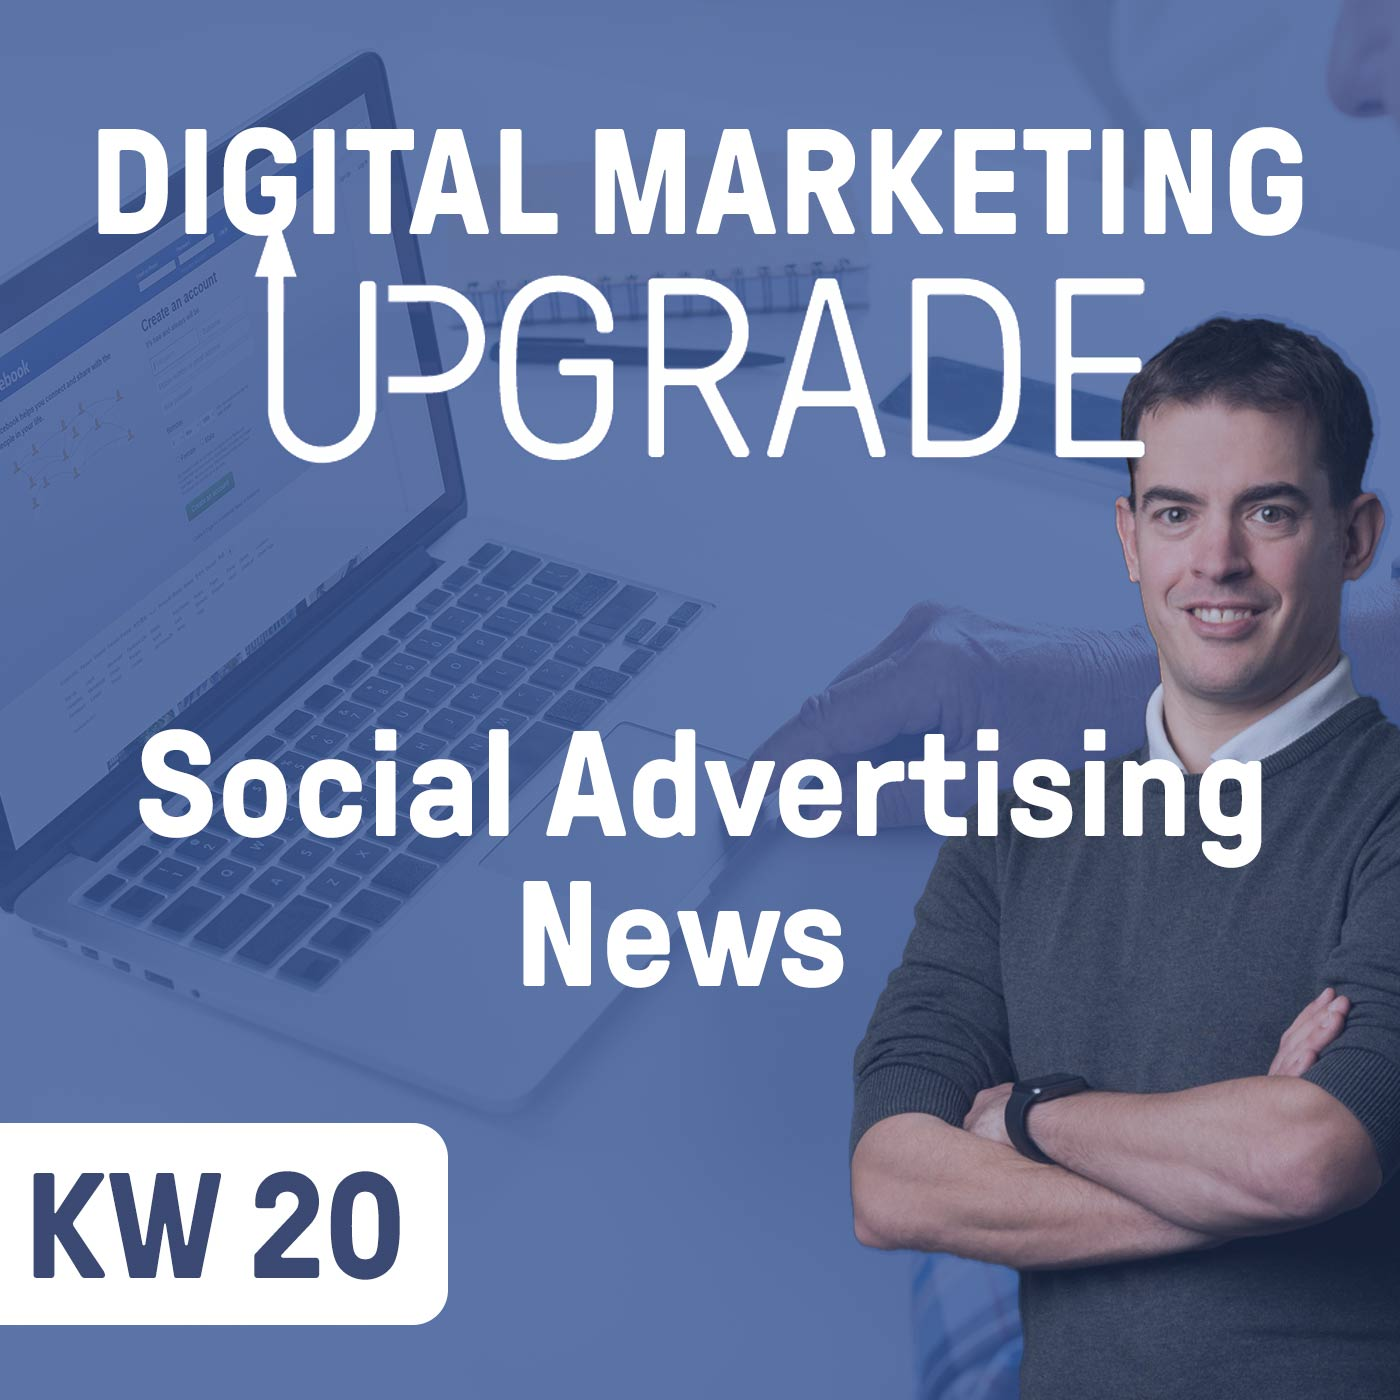 Social Advertising News - KW 20